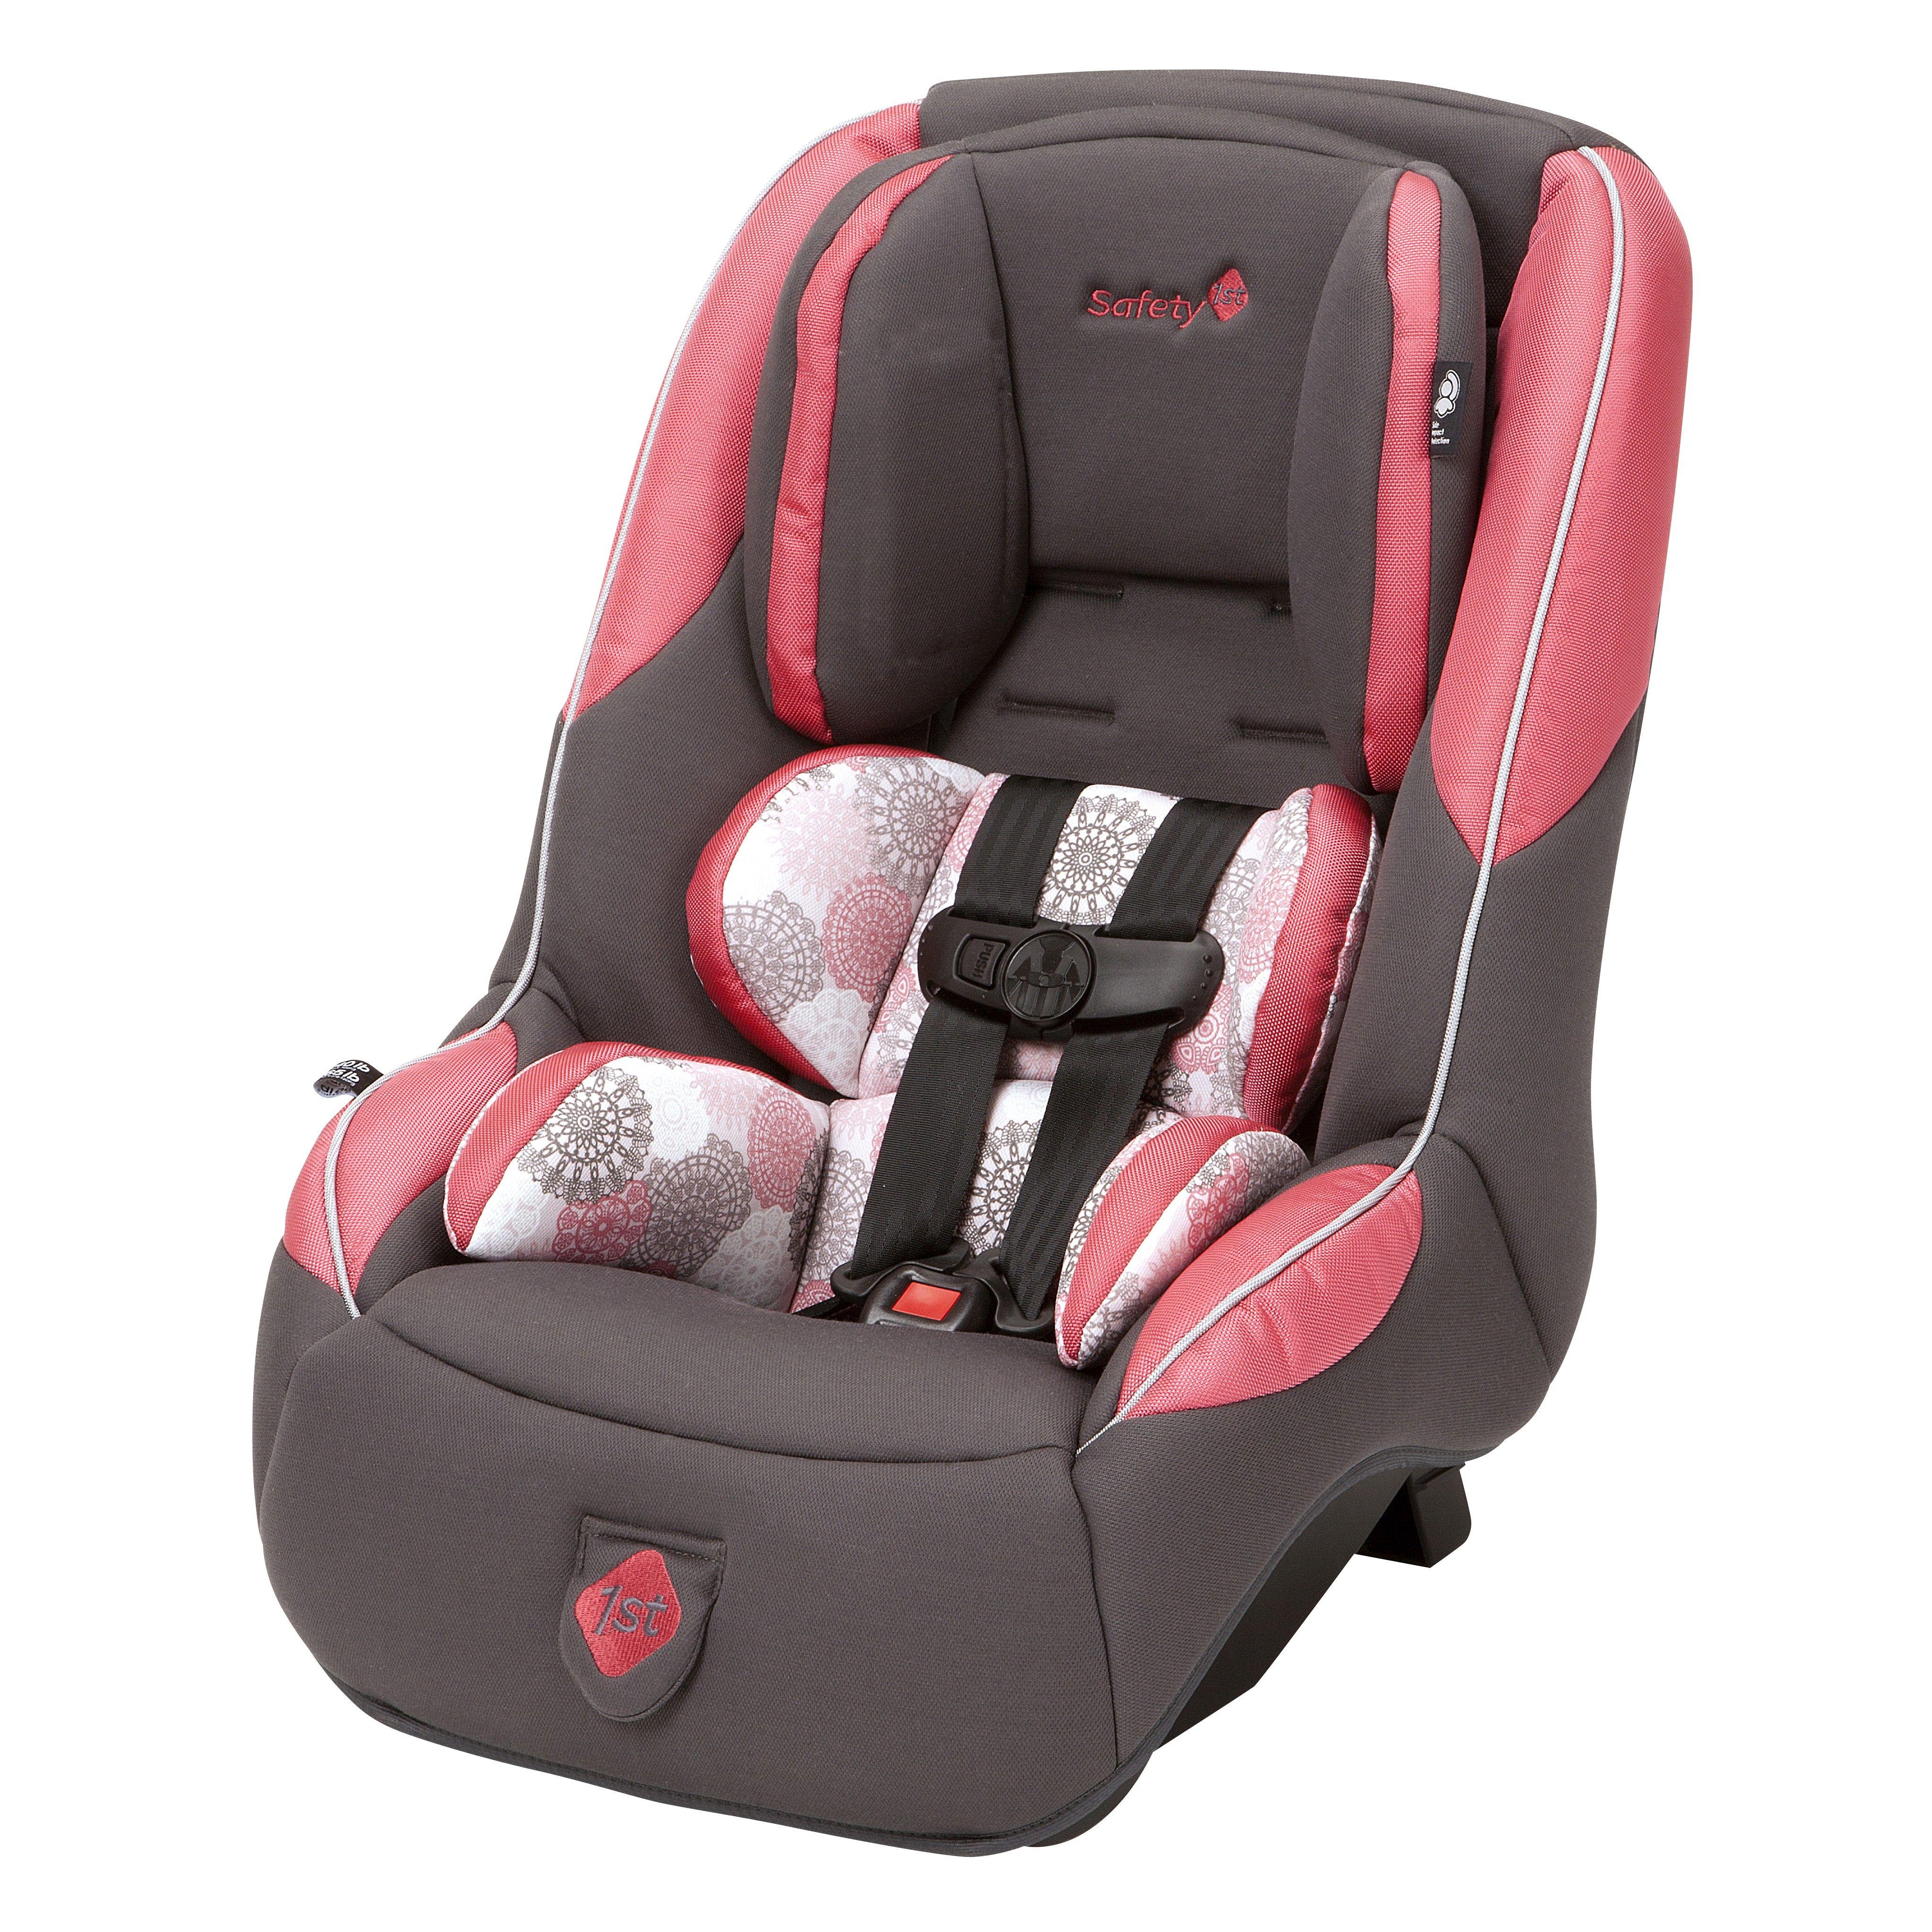 Guide 65 Convertible Car Seat | Baby car seats, Car seats ...